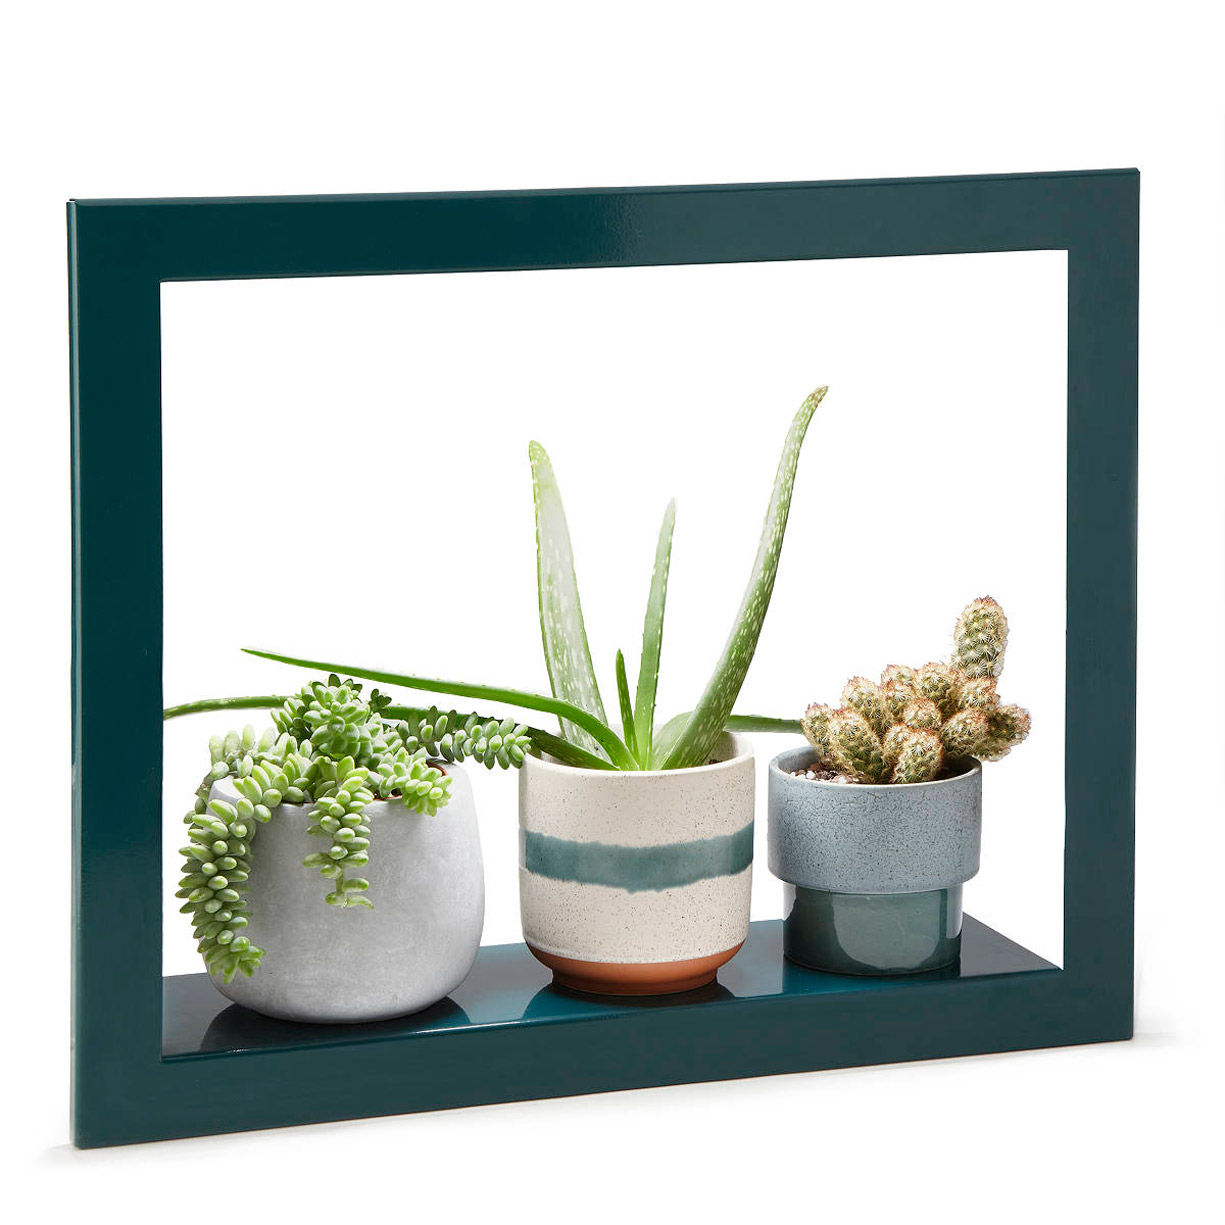 Plant Grow Light Picture Frame Shelf